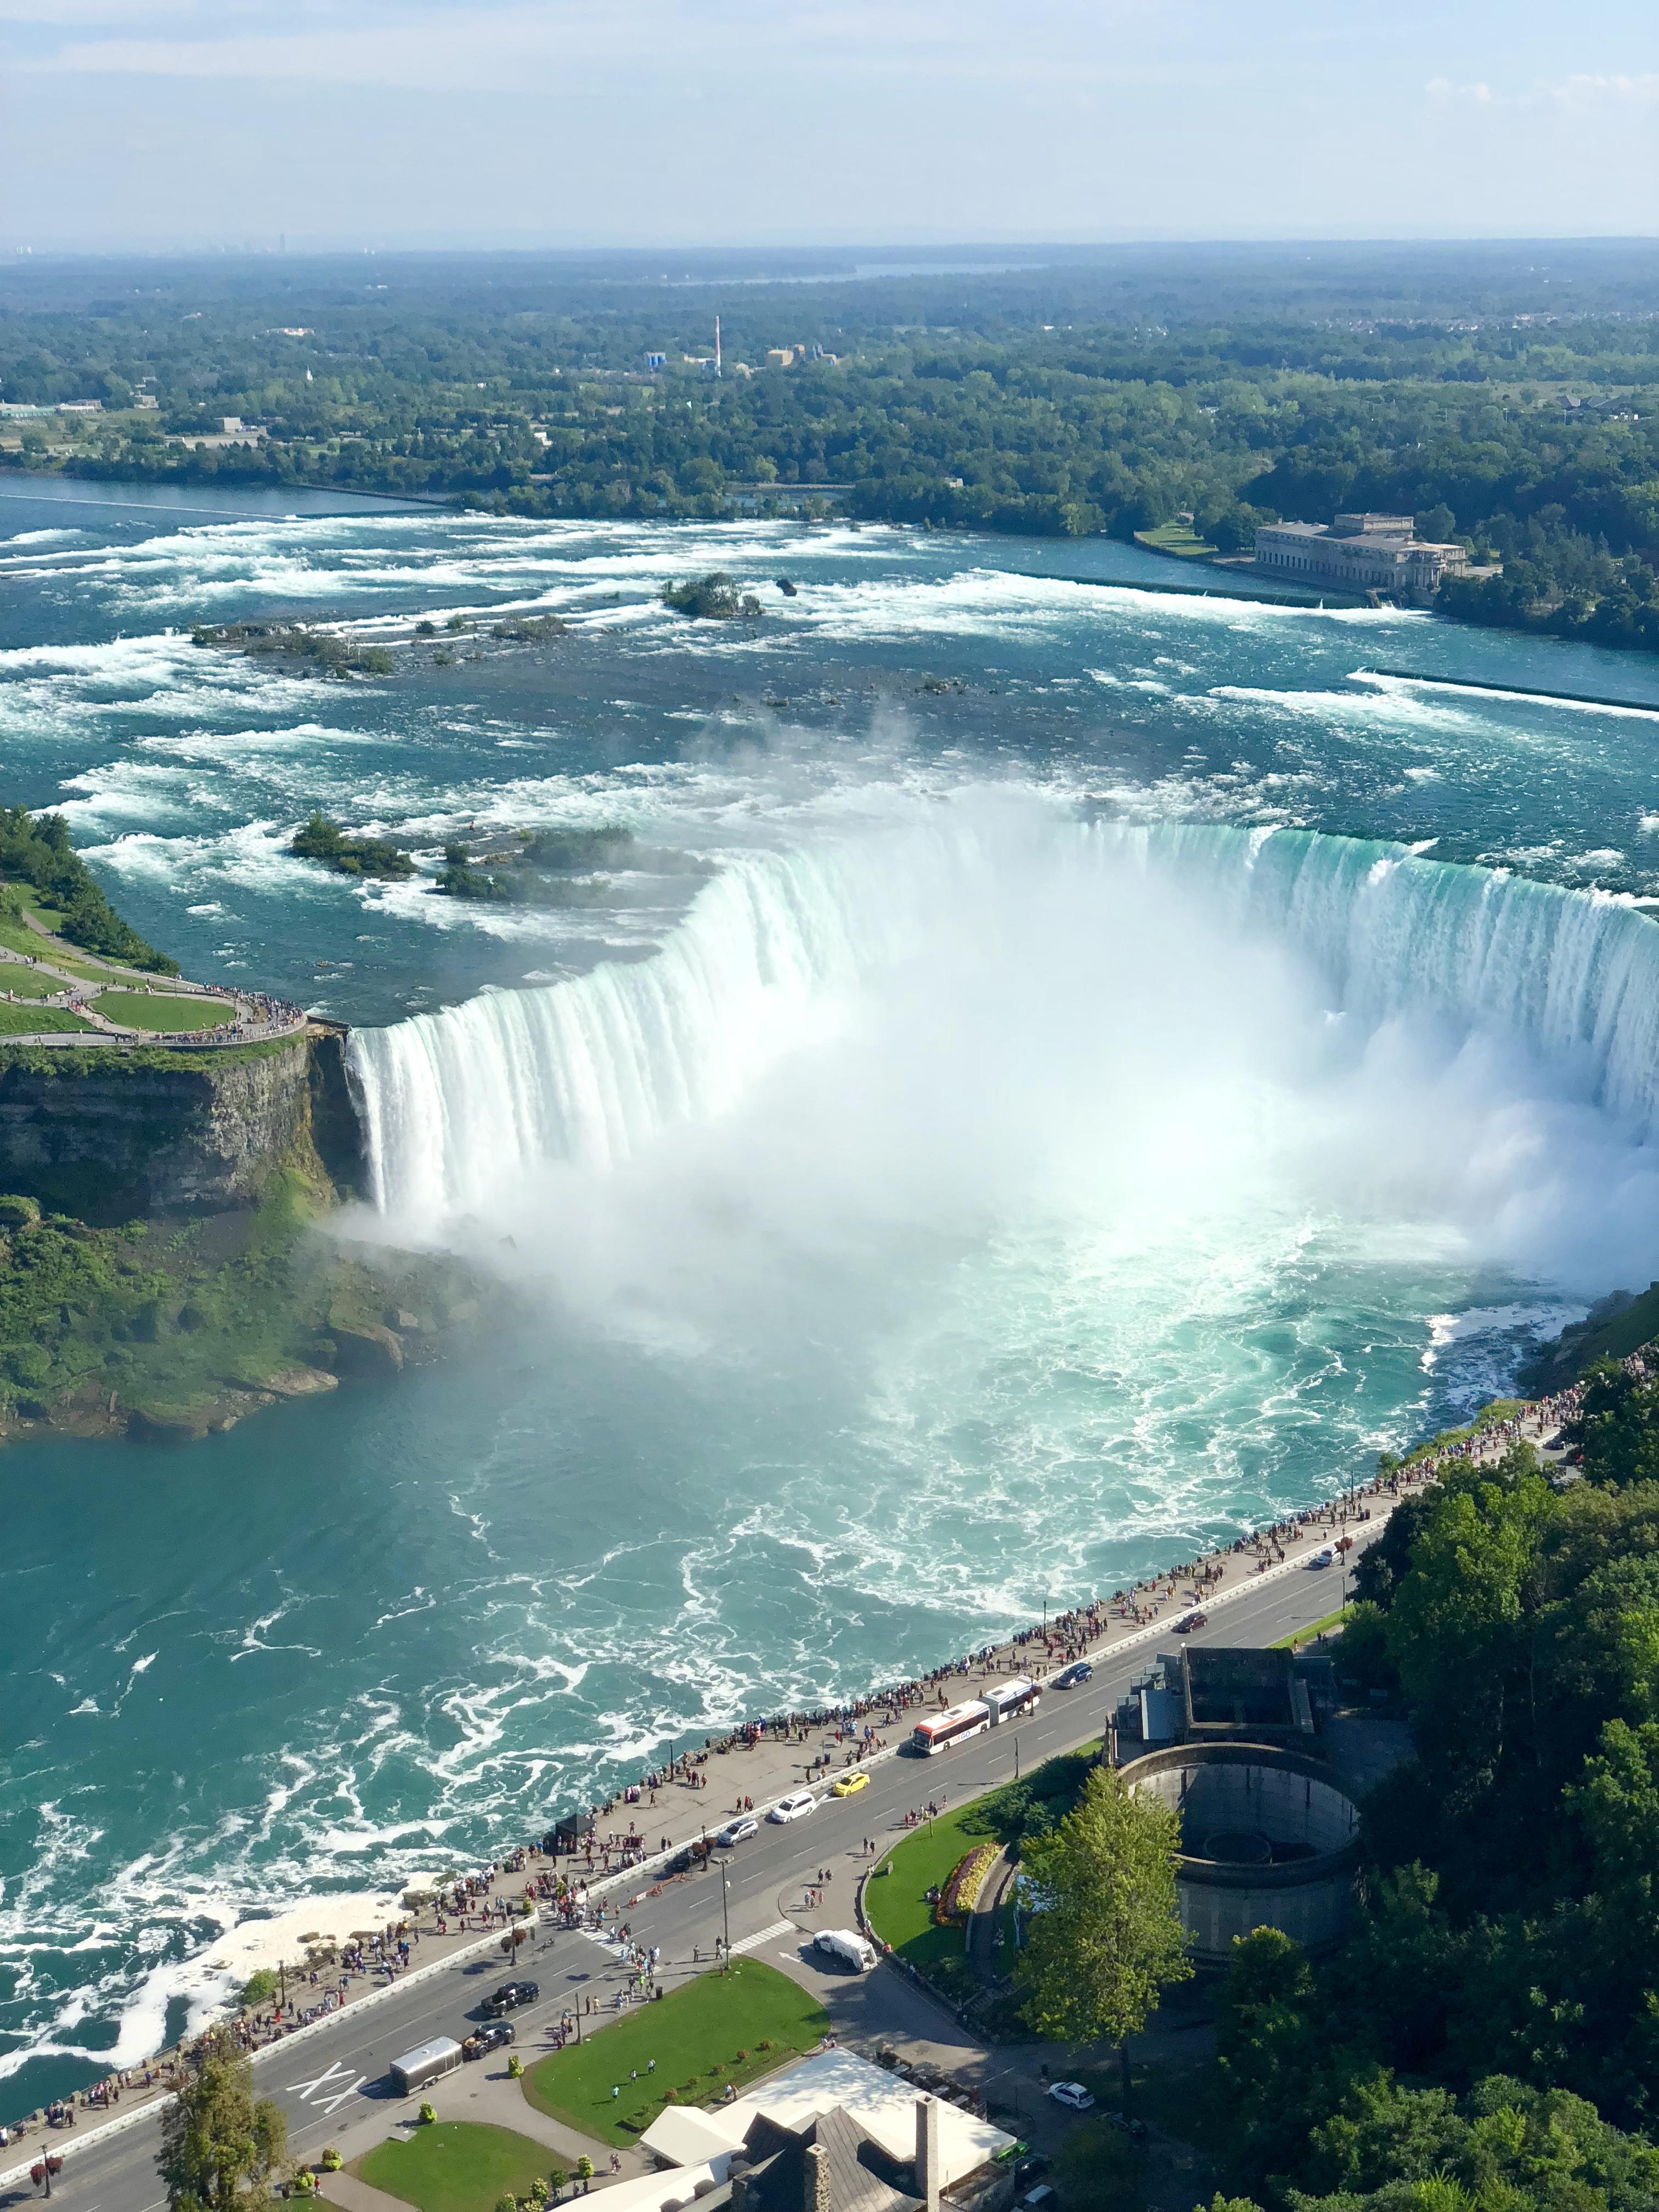 niagara falls, canada, travel tuesday, travel